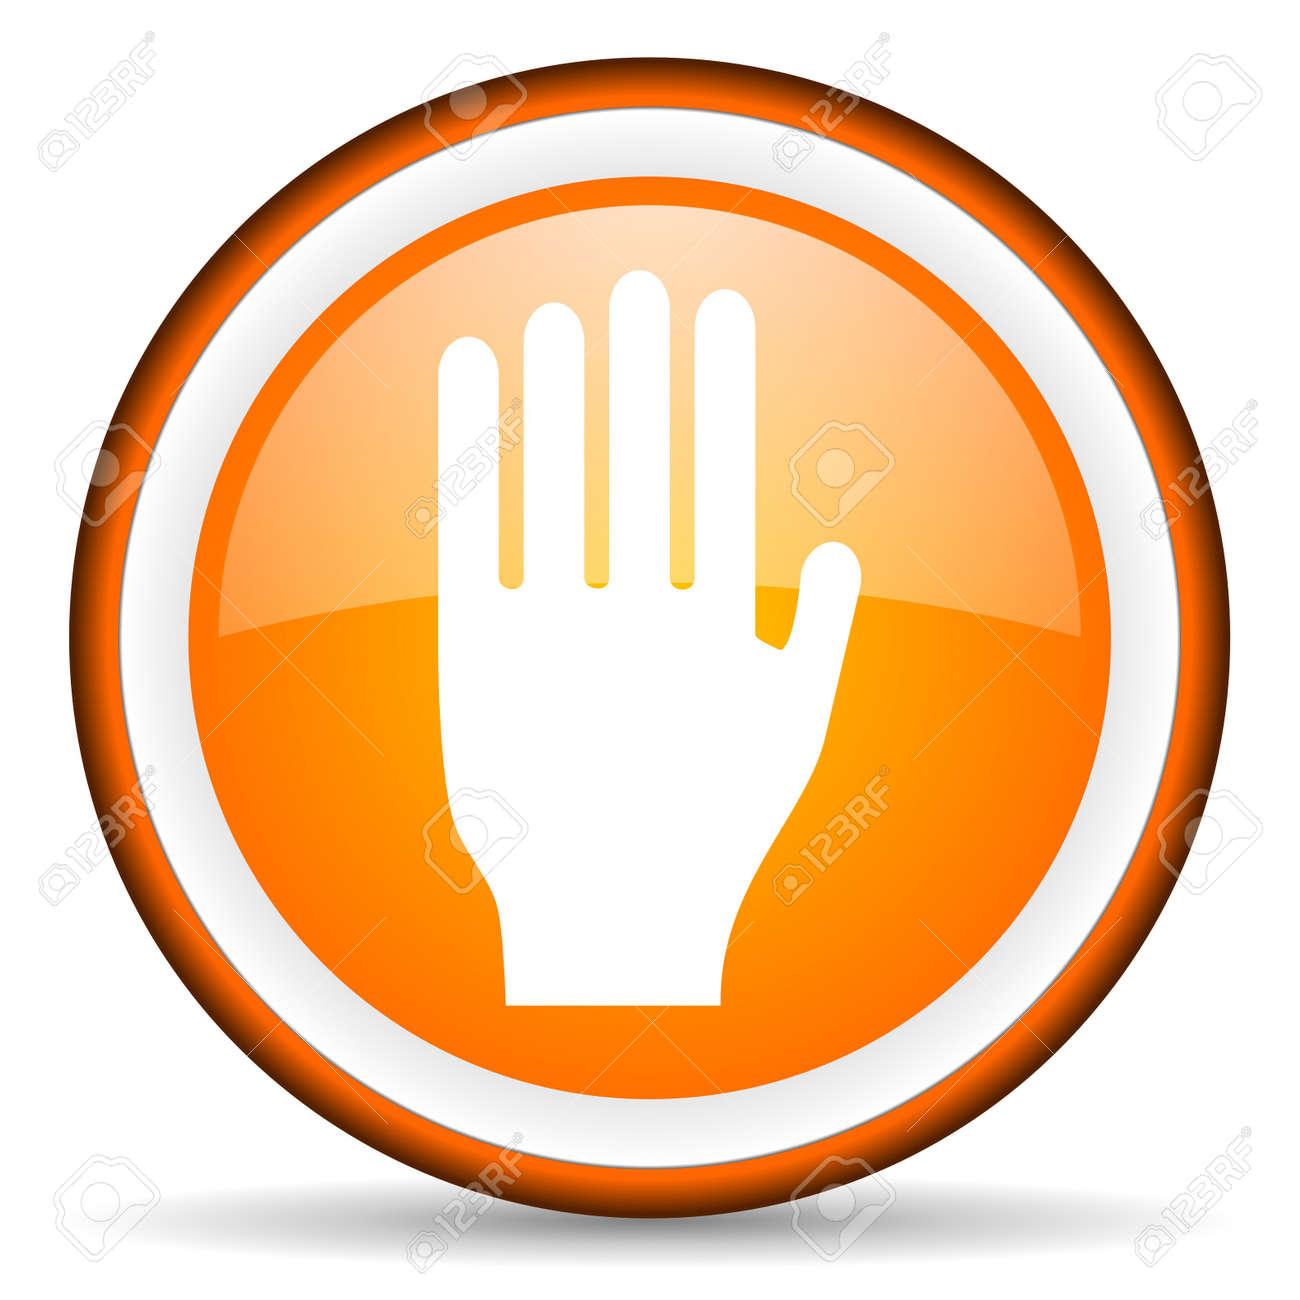 stop orange glossy icon on white background Stock Photo - 17066509